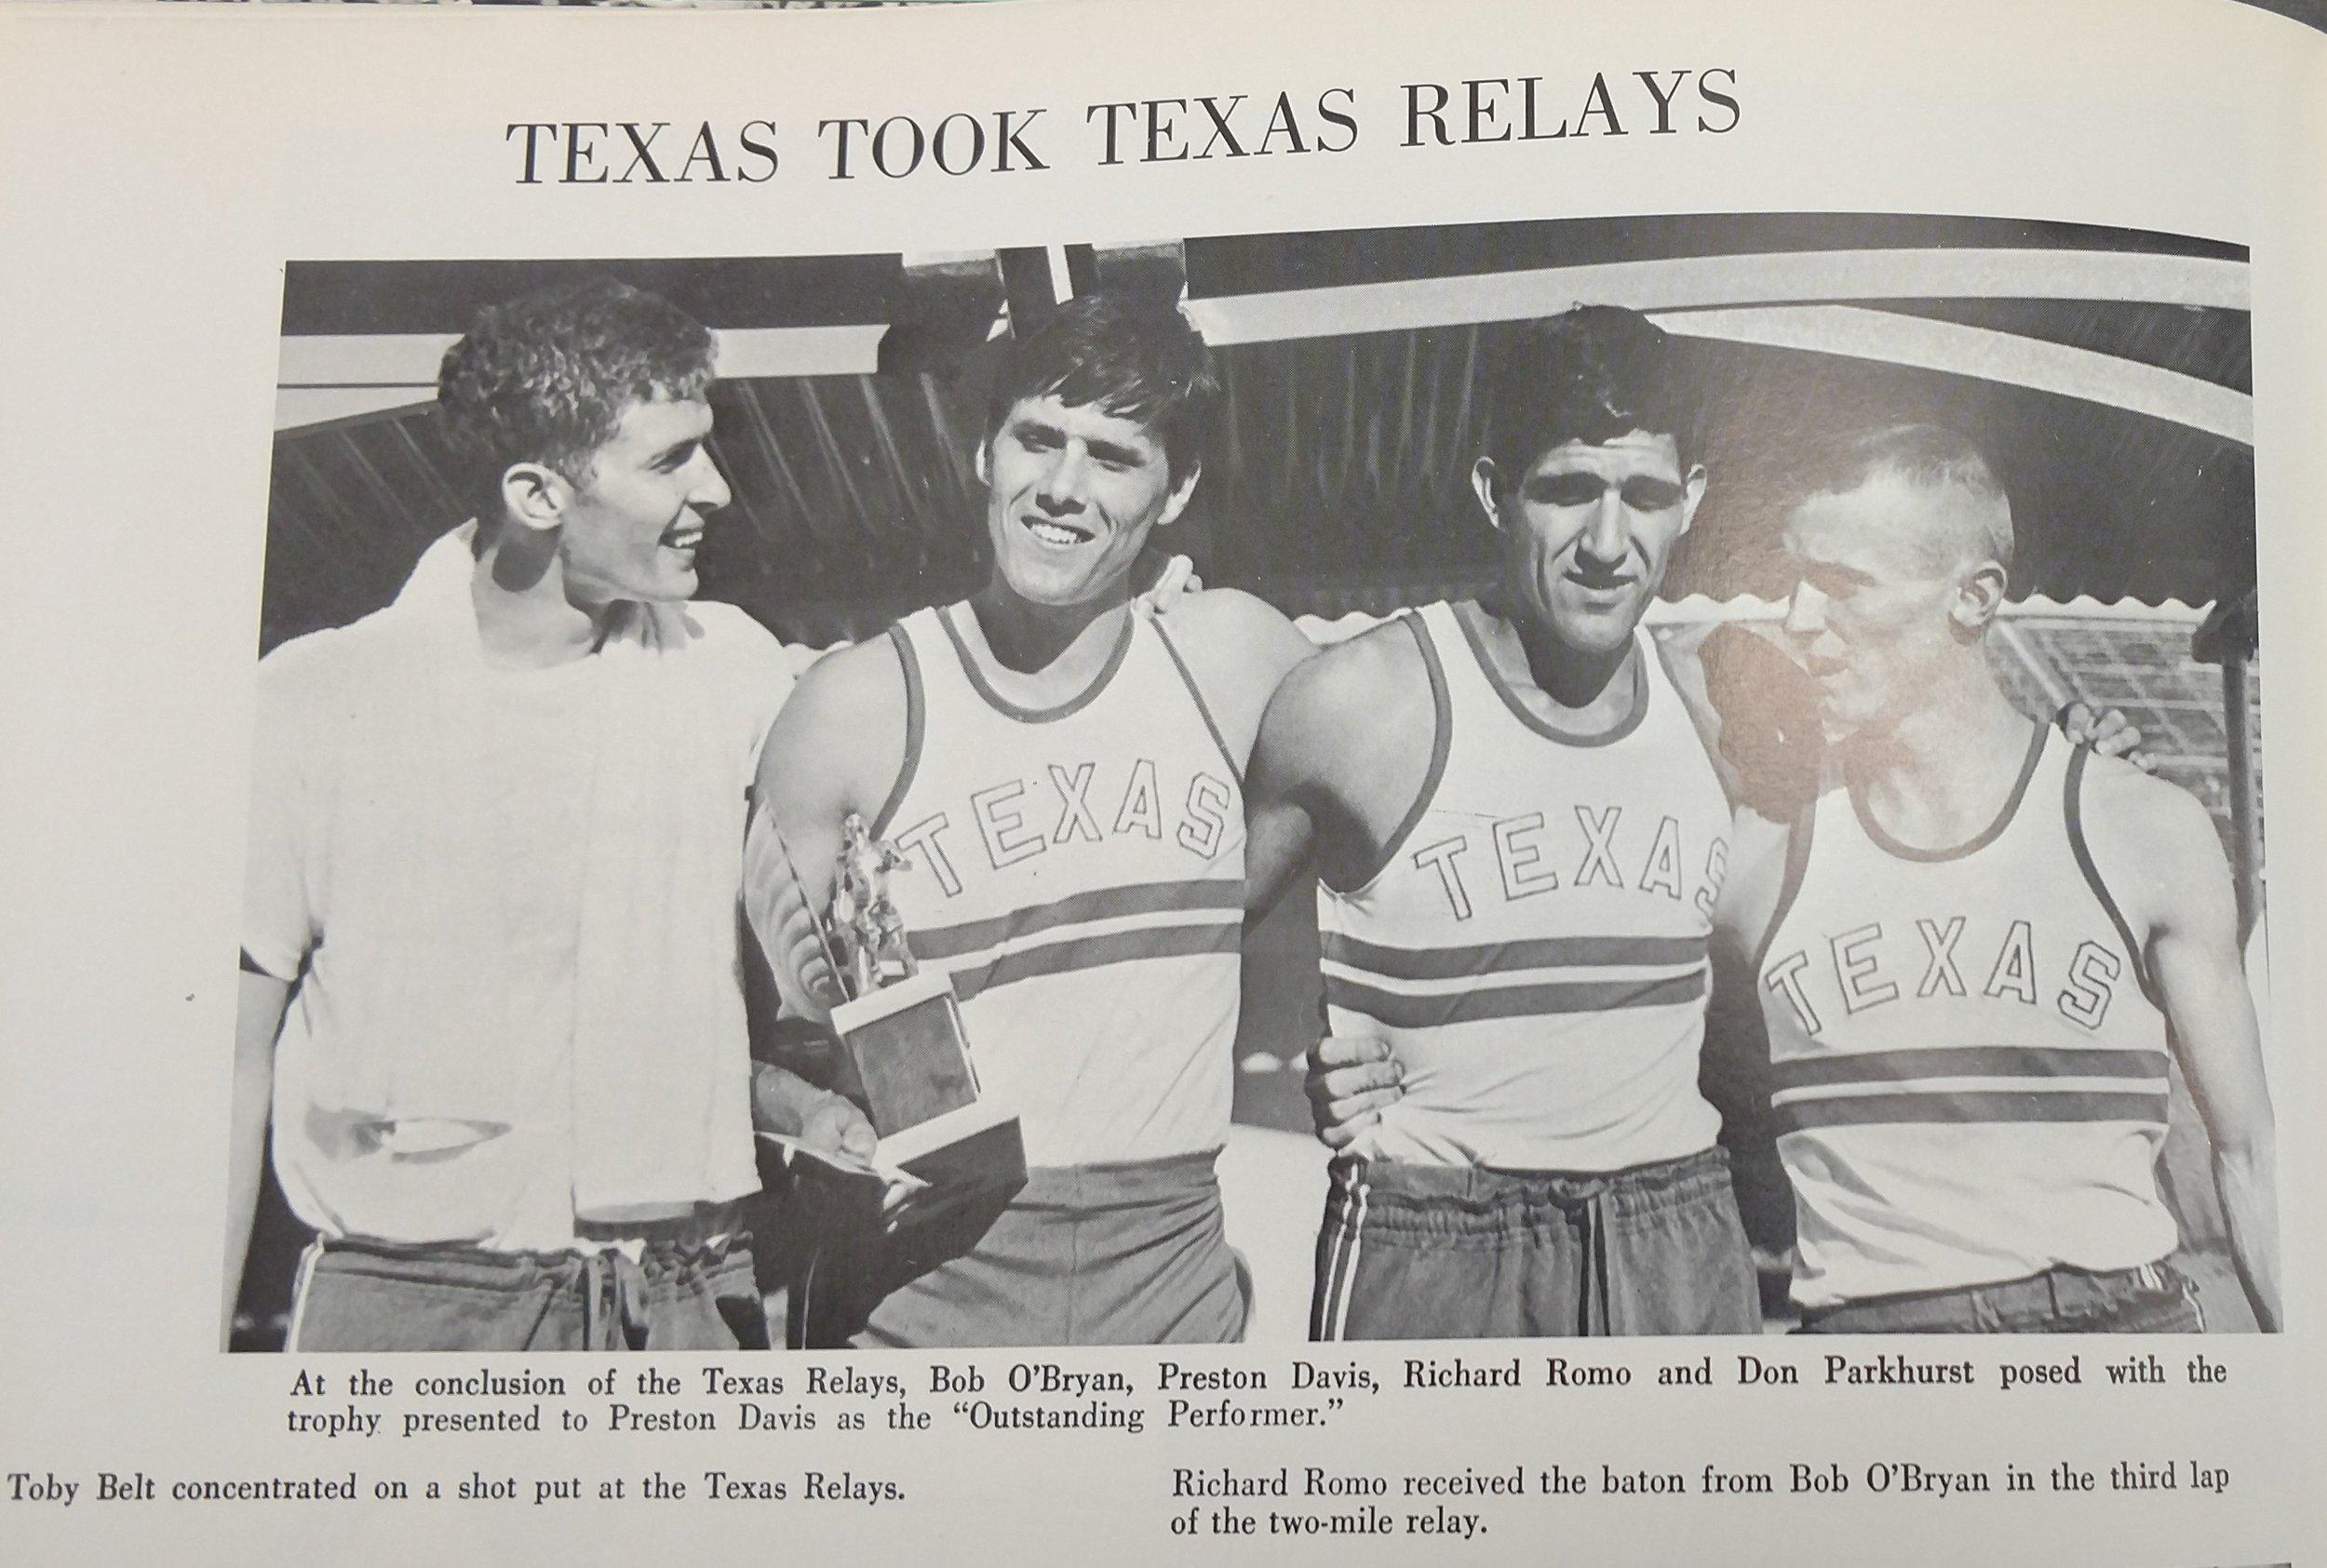 O'Bryan, Davis, Romo and Parkhurst.